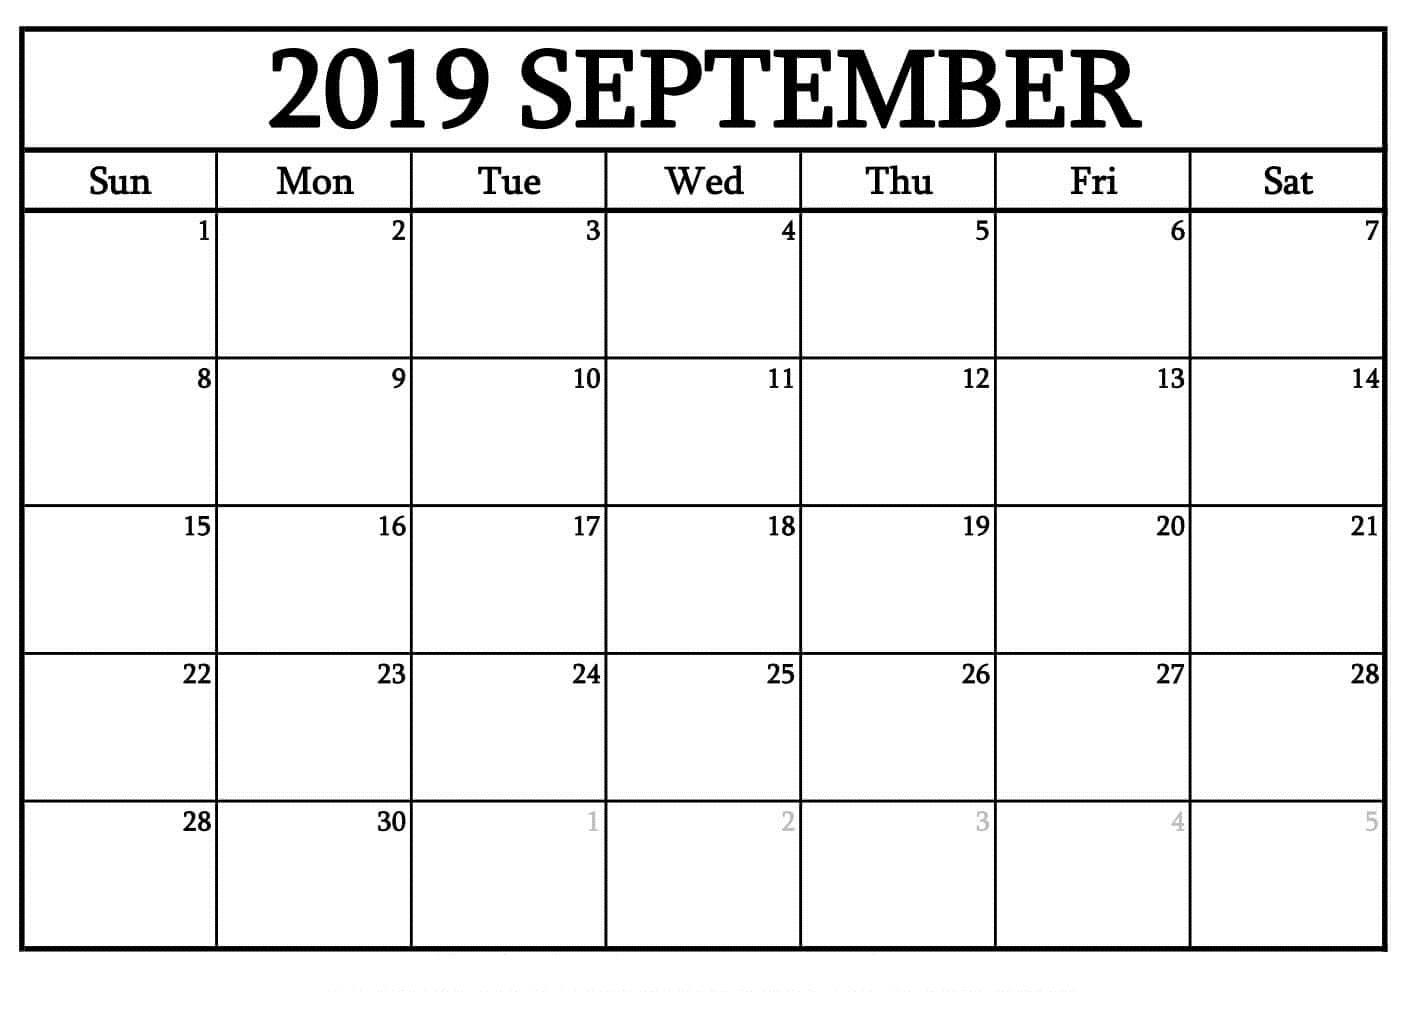 Printable September 2019 Blank Calendar Templates Free - Print Calendar pertaining to September Printable Monthly Calendars Blank